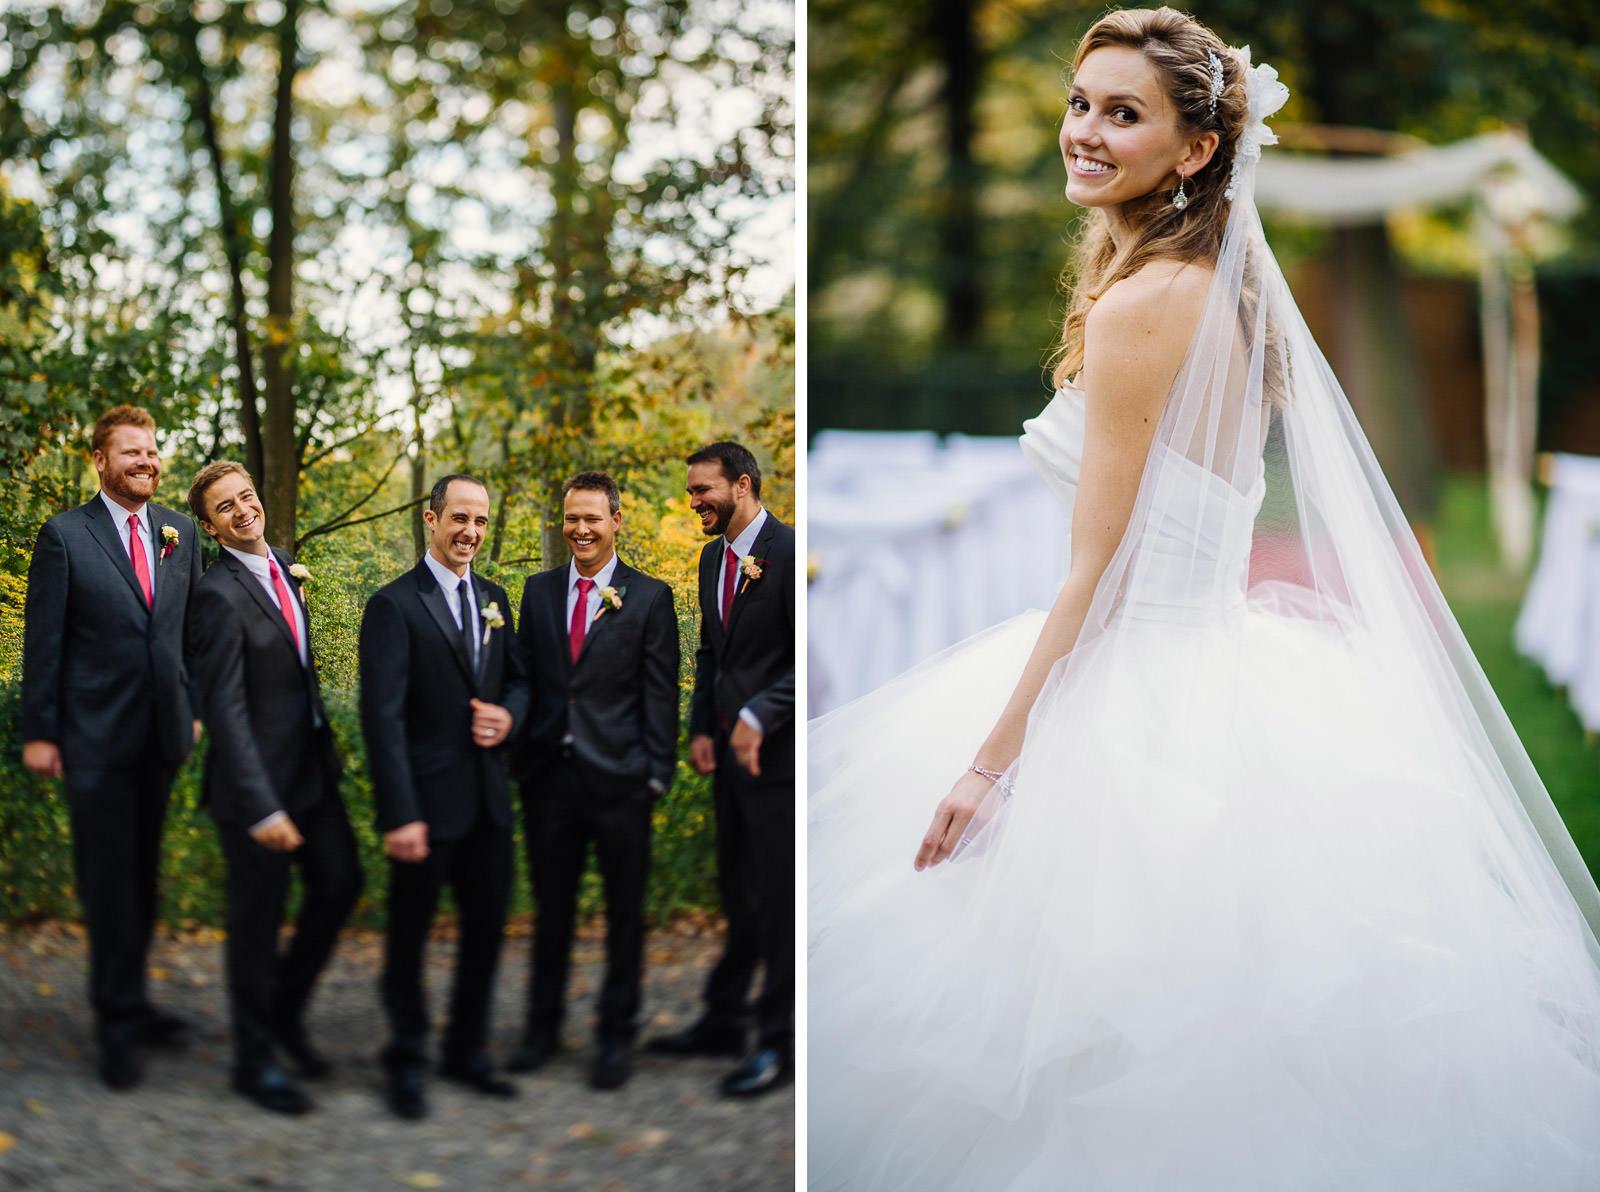 Castle Wedding Photography Korzkiew Poland 72